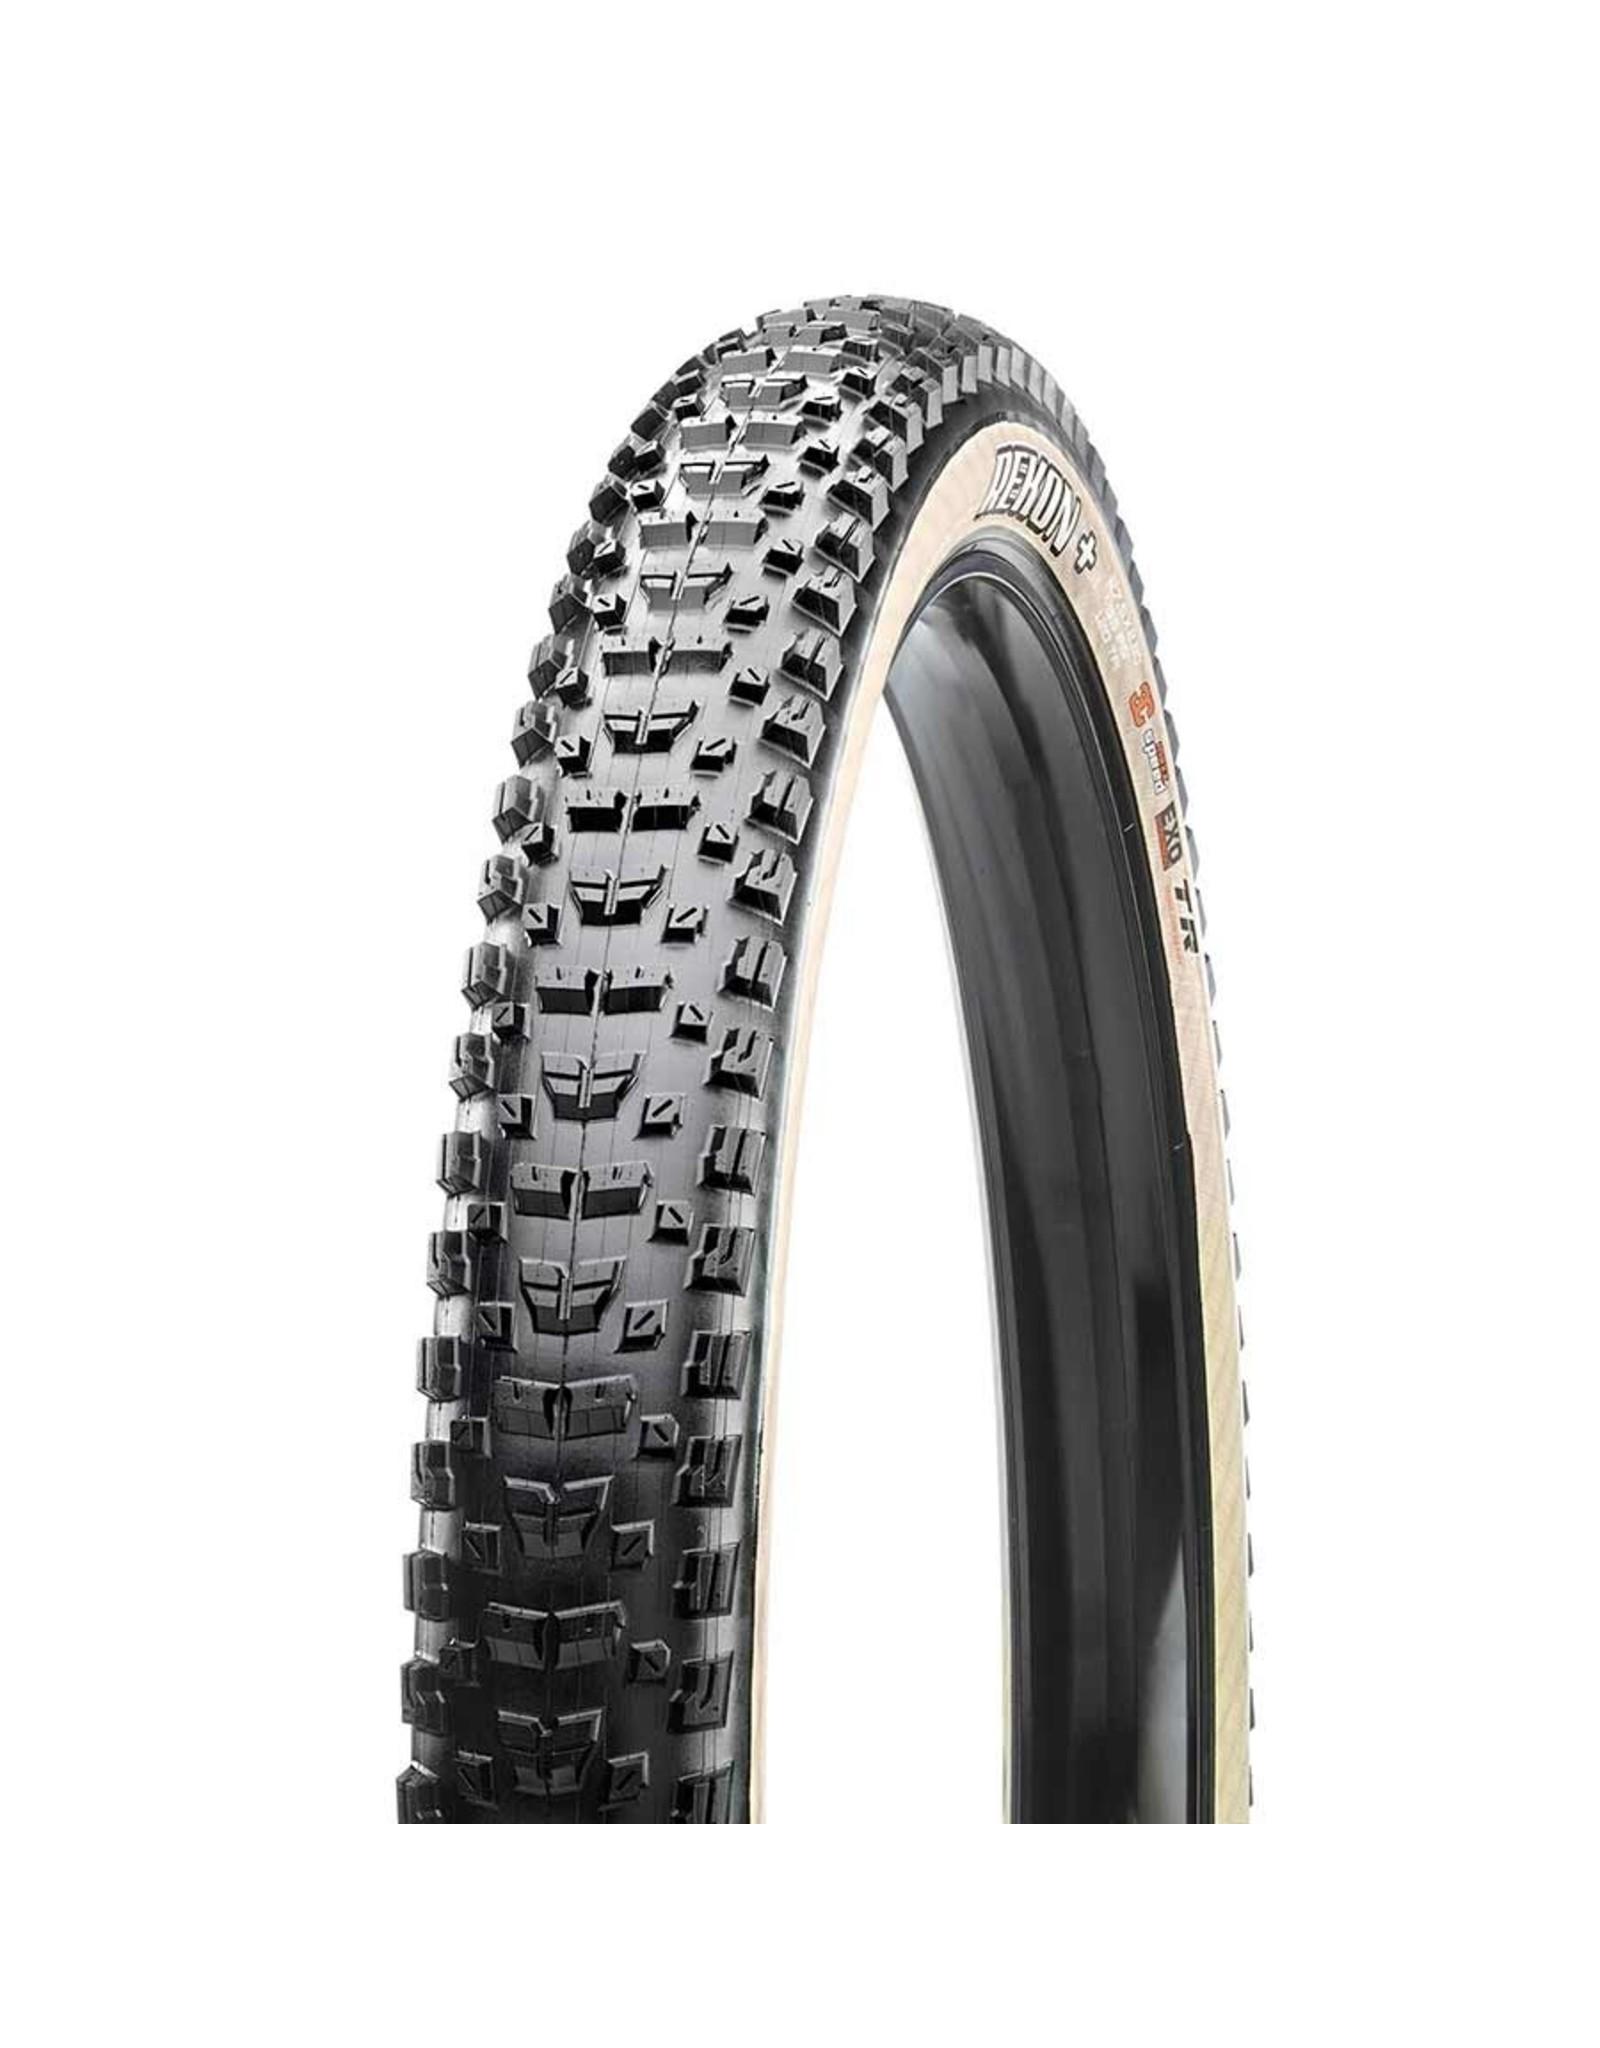 Maxxis, Rekon+, Tire, 27.5''x2.80, Folding, Tubeless Ready, 3C Maxx Terra, EXO, 60TPI, Beige